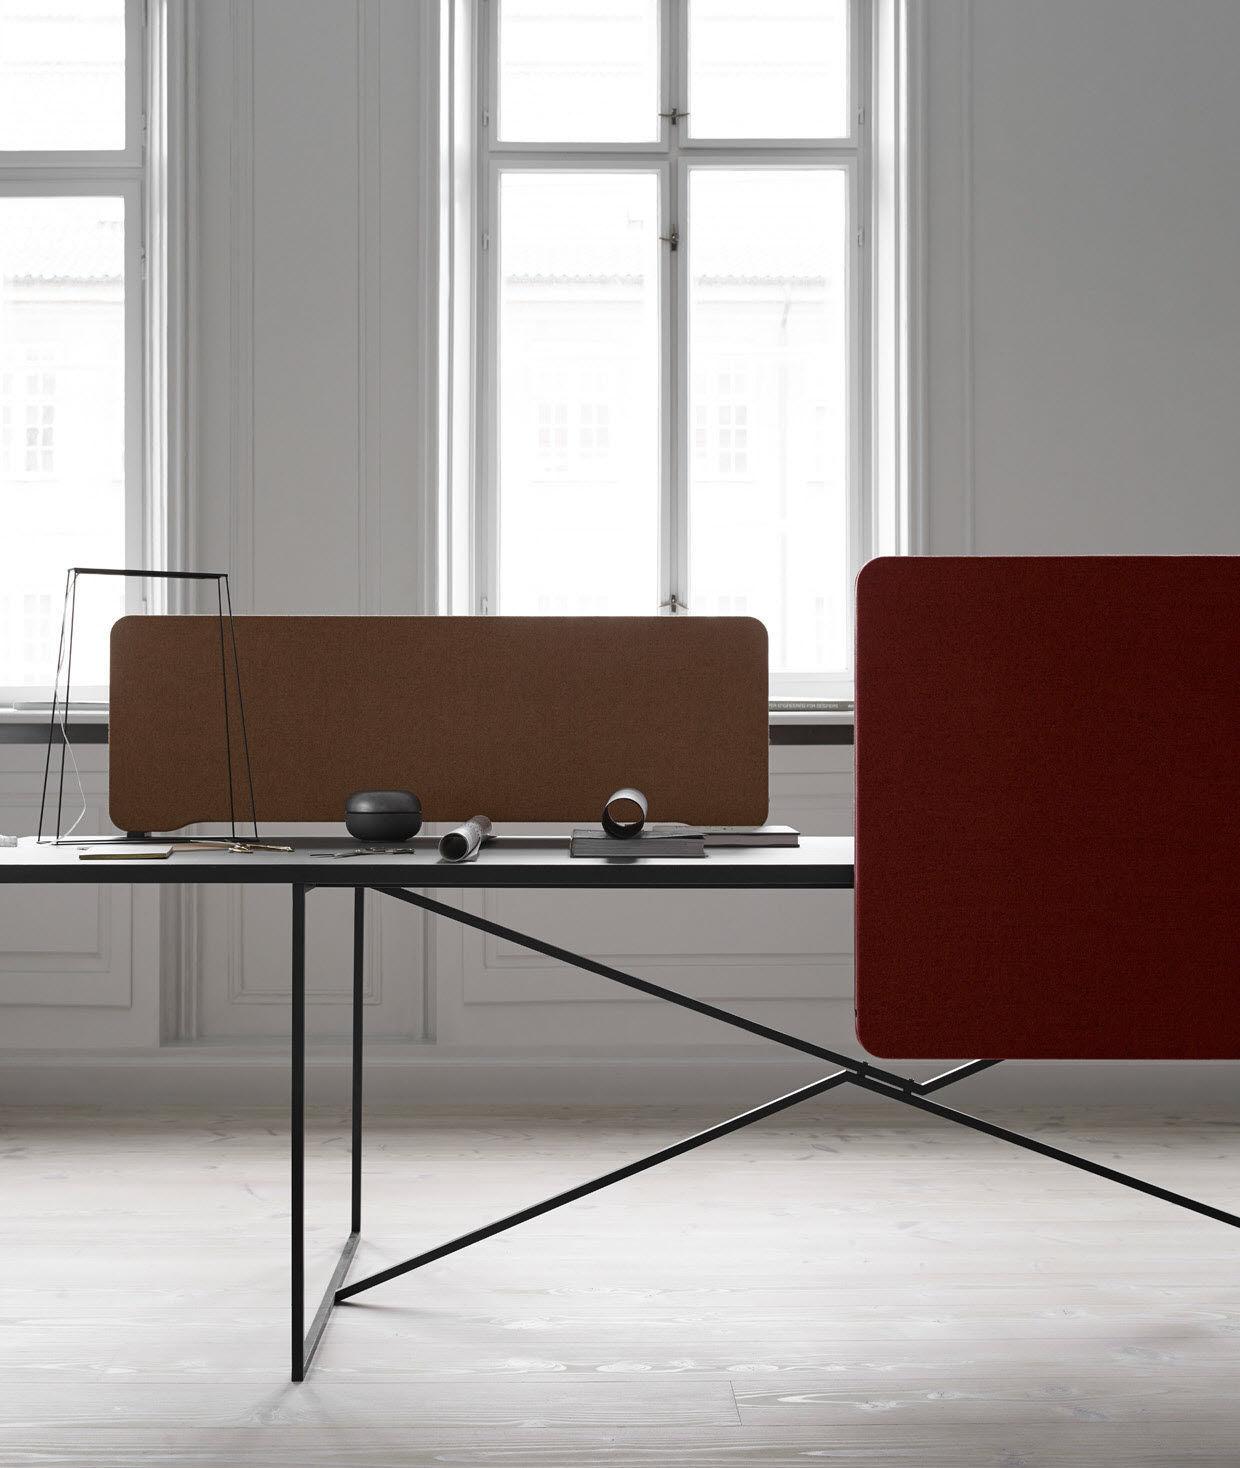 Bürotrennwand für Theken / Stoff / Holz - EDGE by Christian Halleröd ...